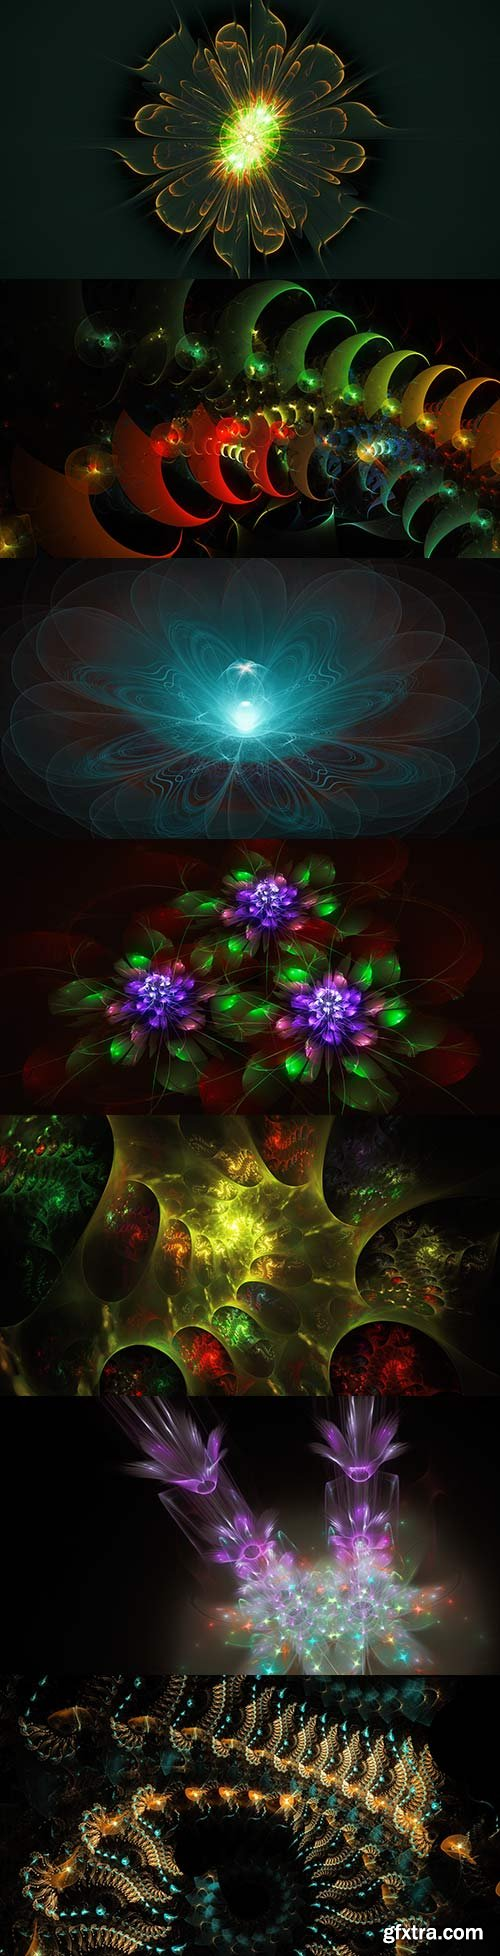 Extraterrestrial world of fractals - 4